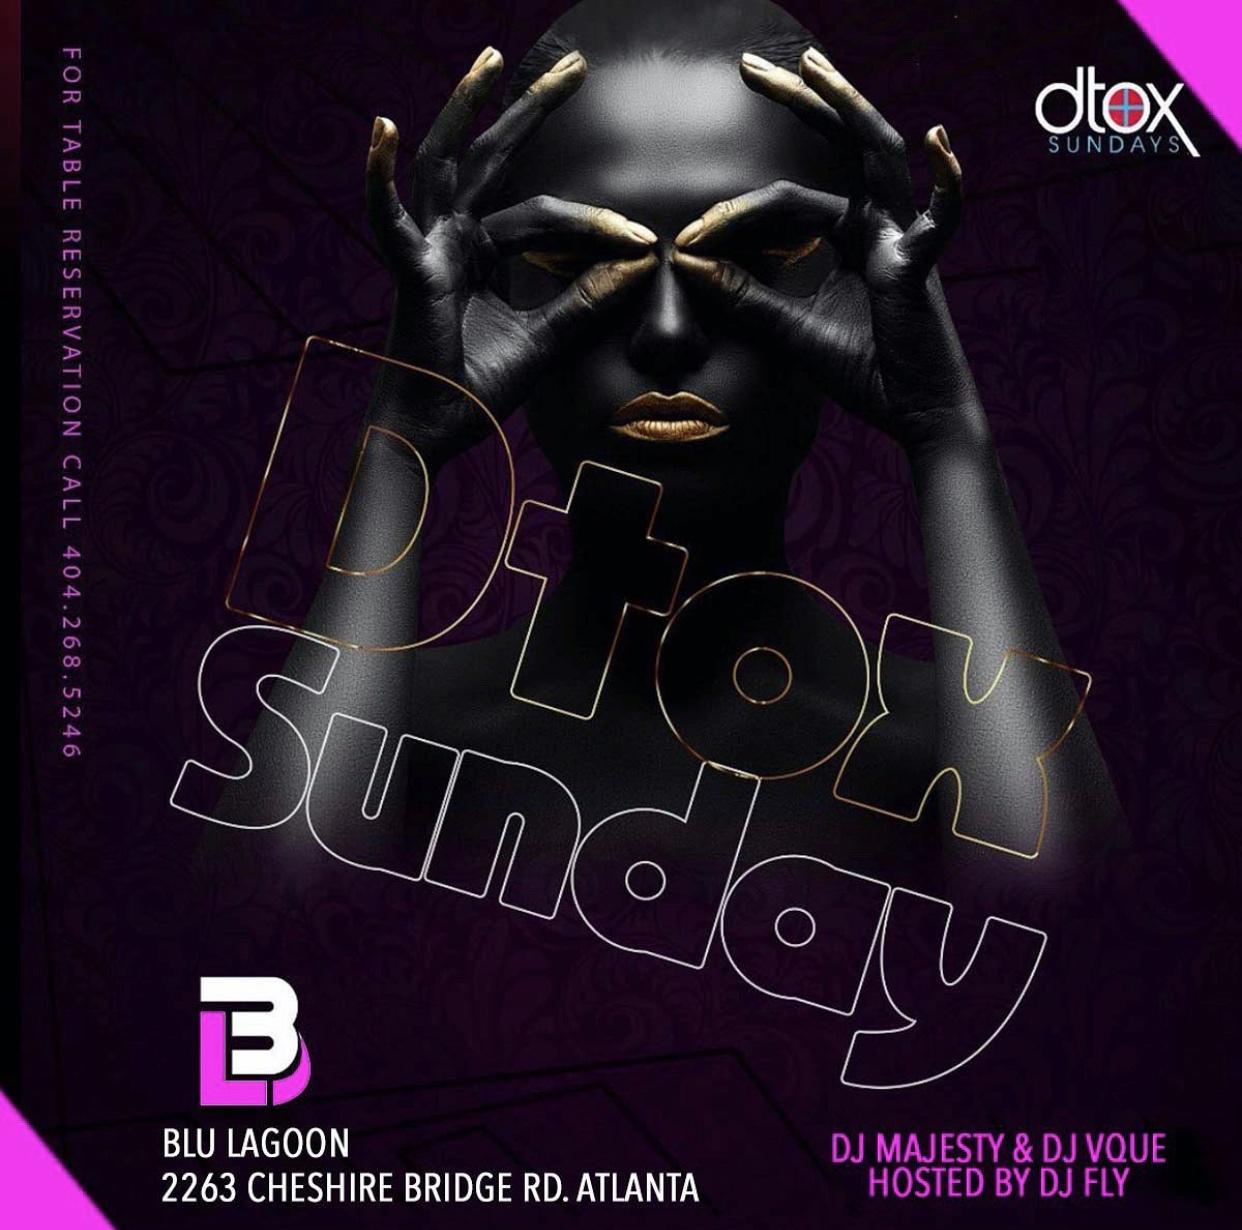 DTOX Sundays